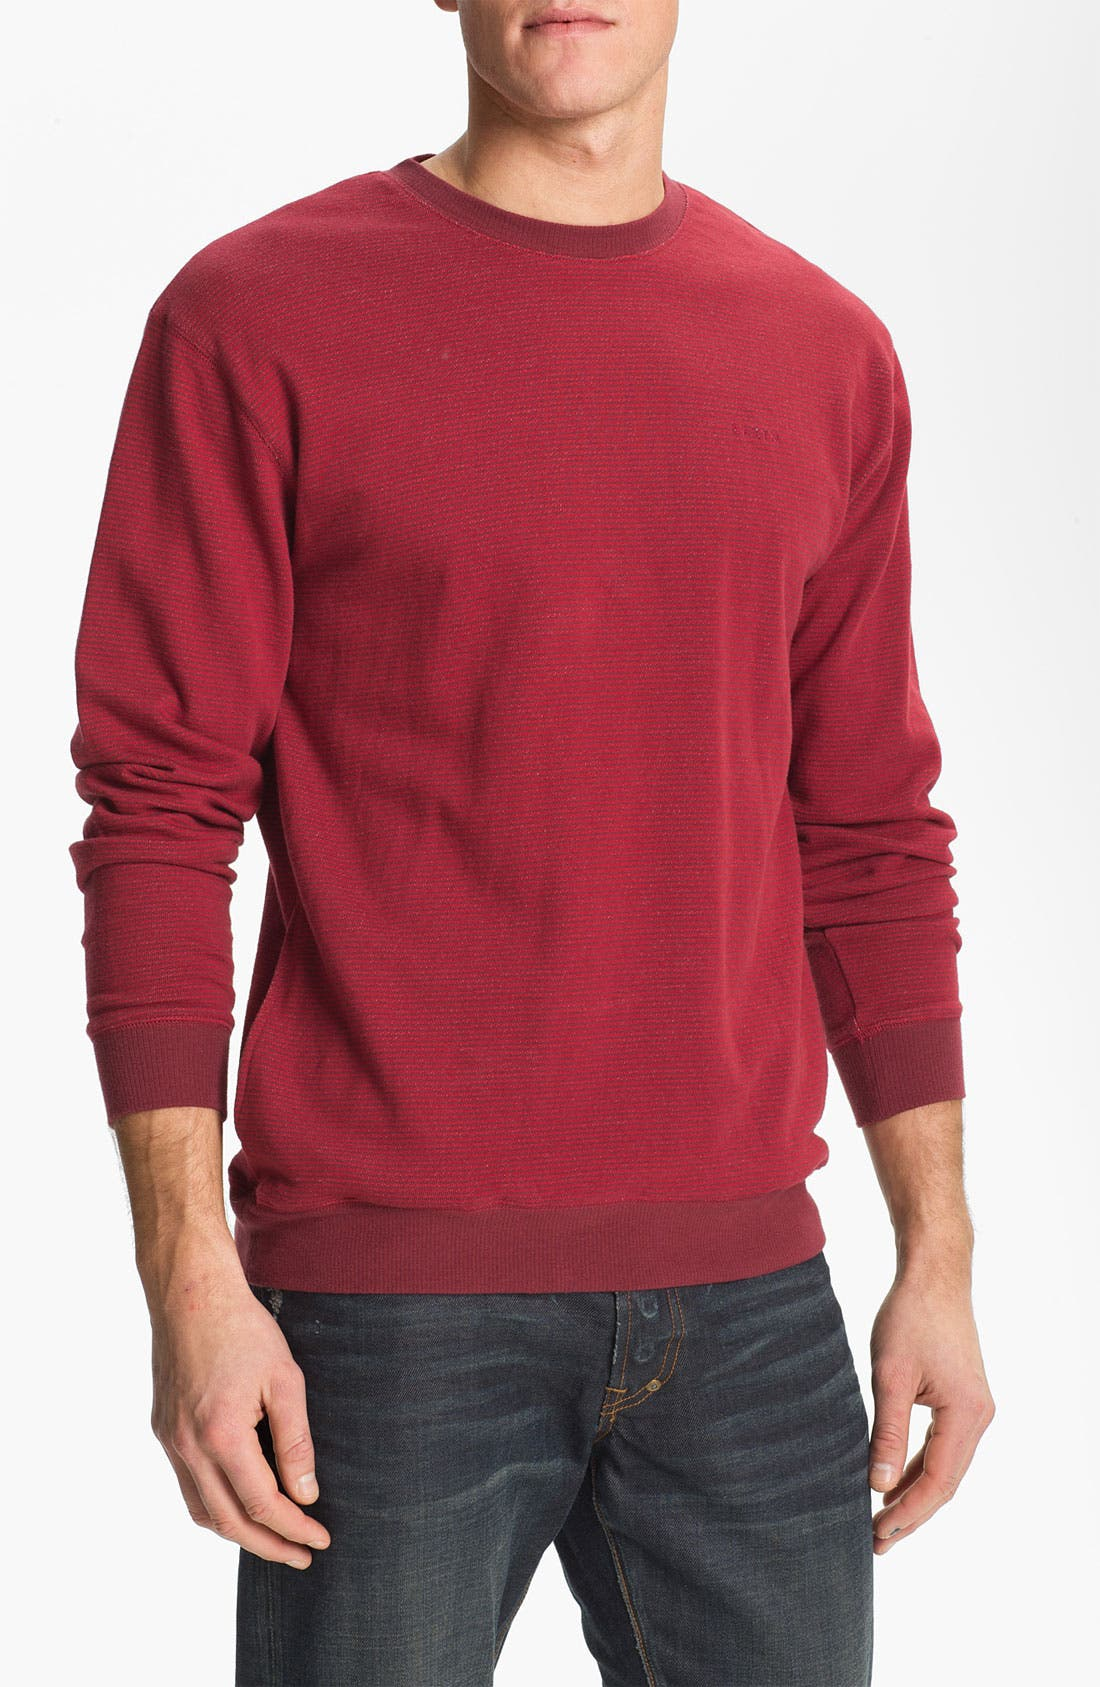 Main Image - Brixton 'Partisan' Stripe French Terry Crewneck Sweatshirt